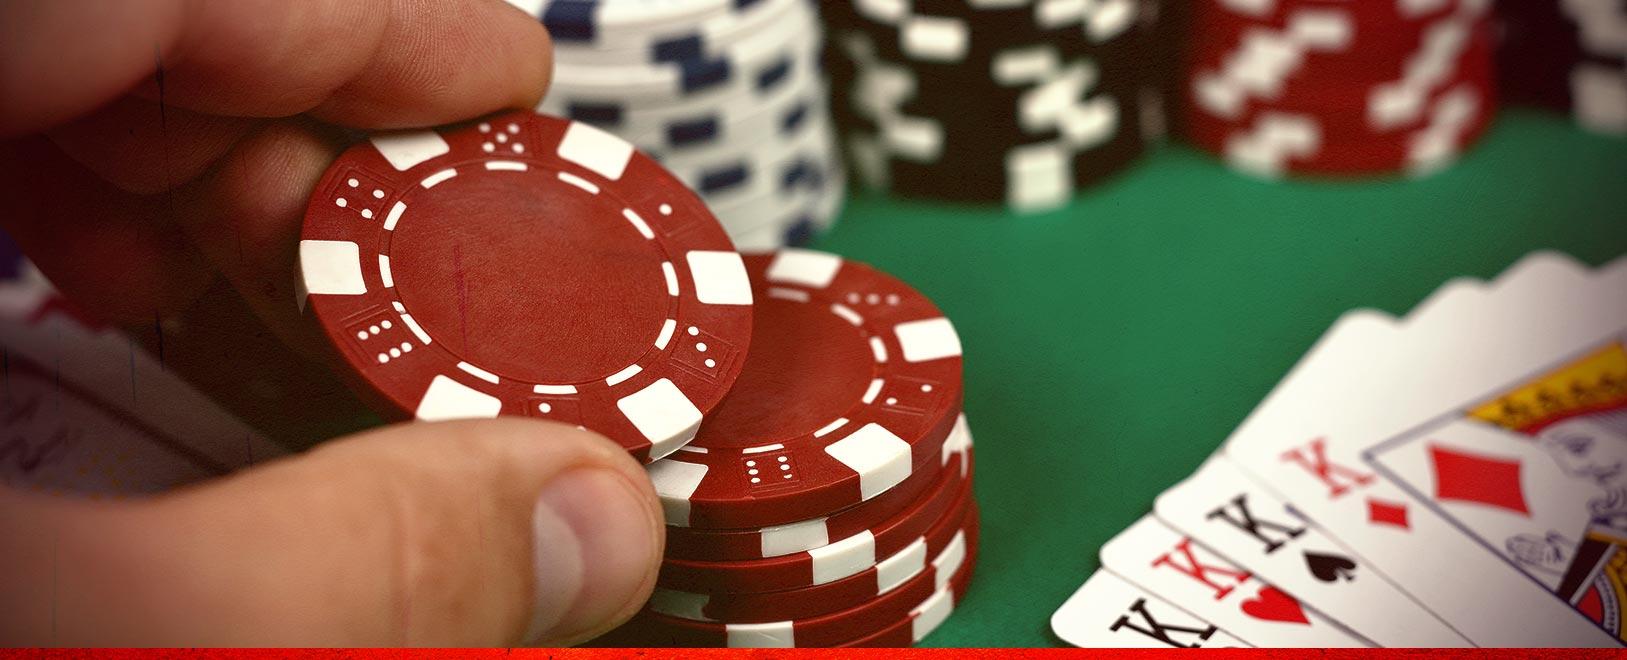 Poker Tournament Bankroll Management Strategy